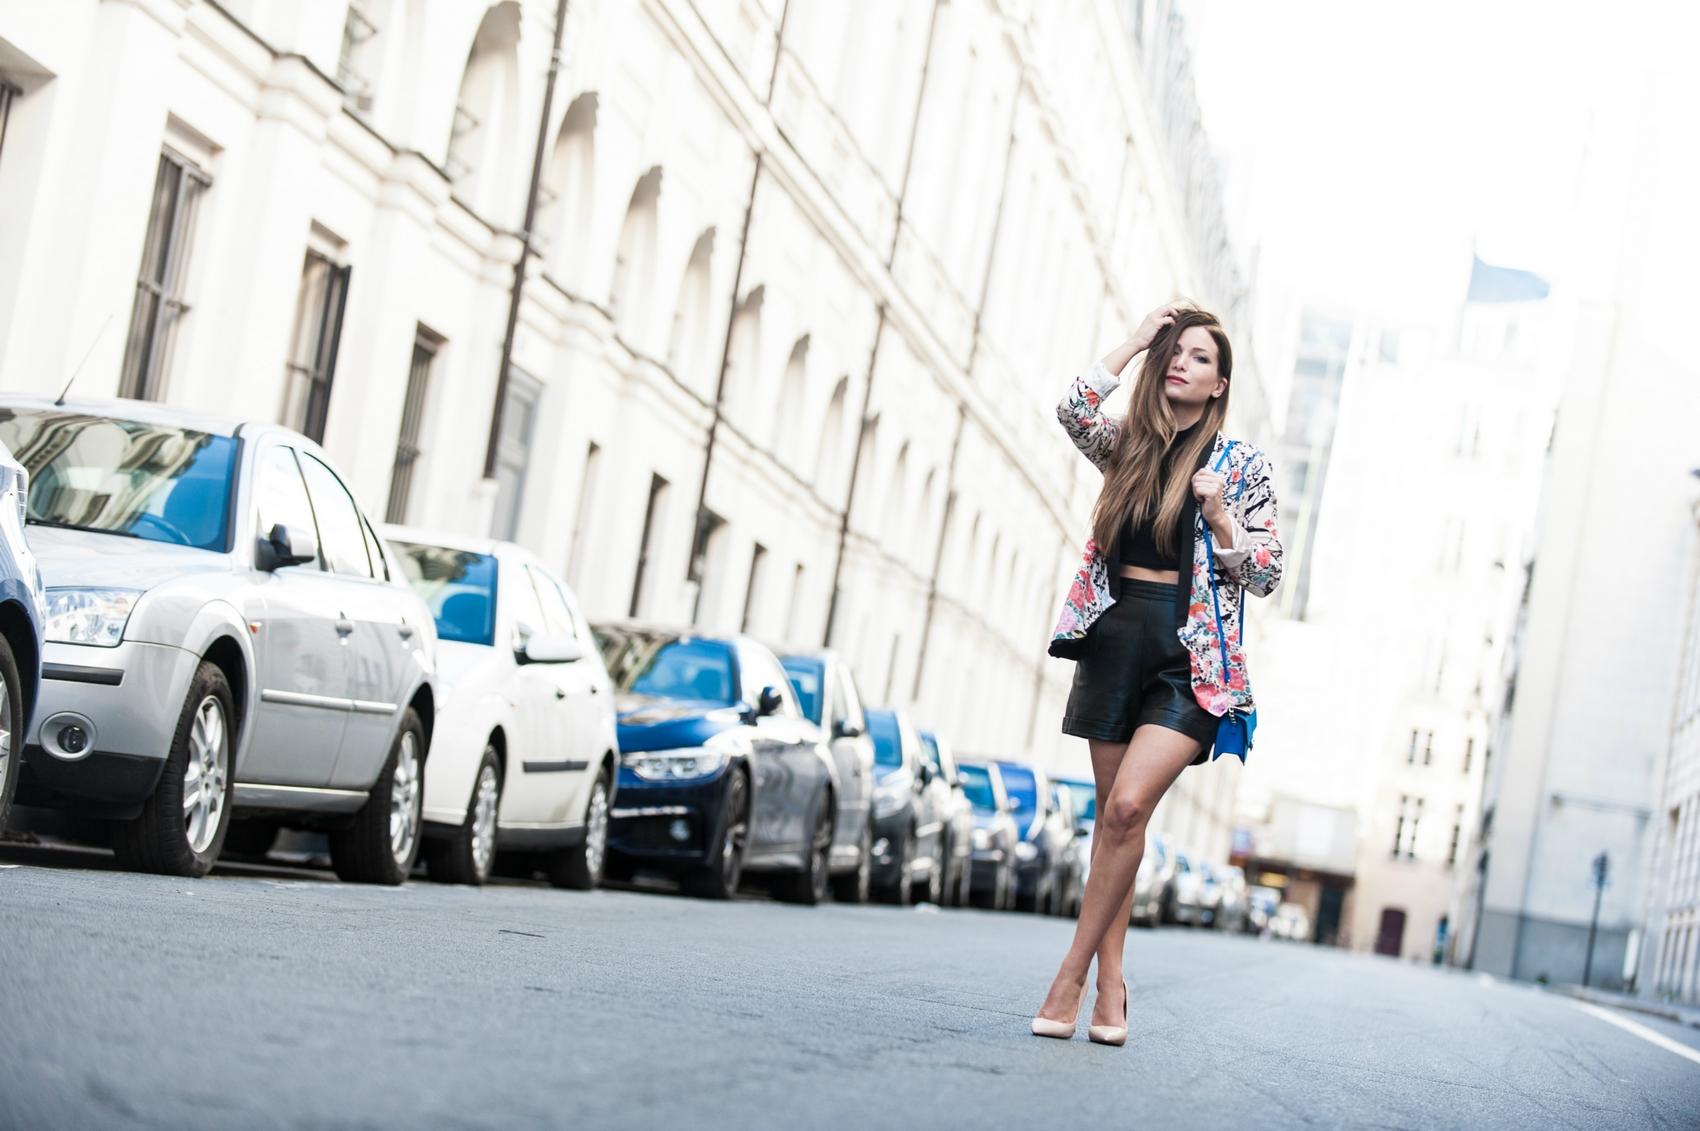 sheinside jacket leather high waist short crop top stiletto high heels